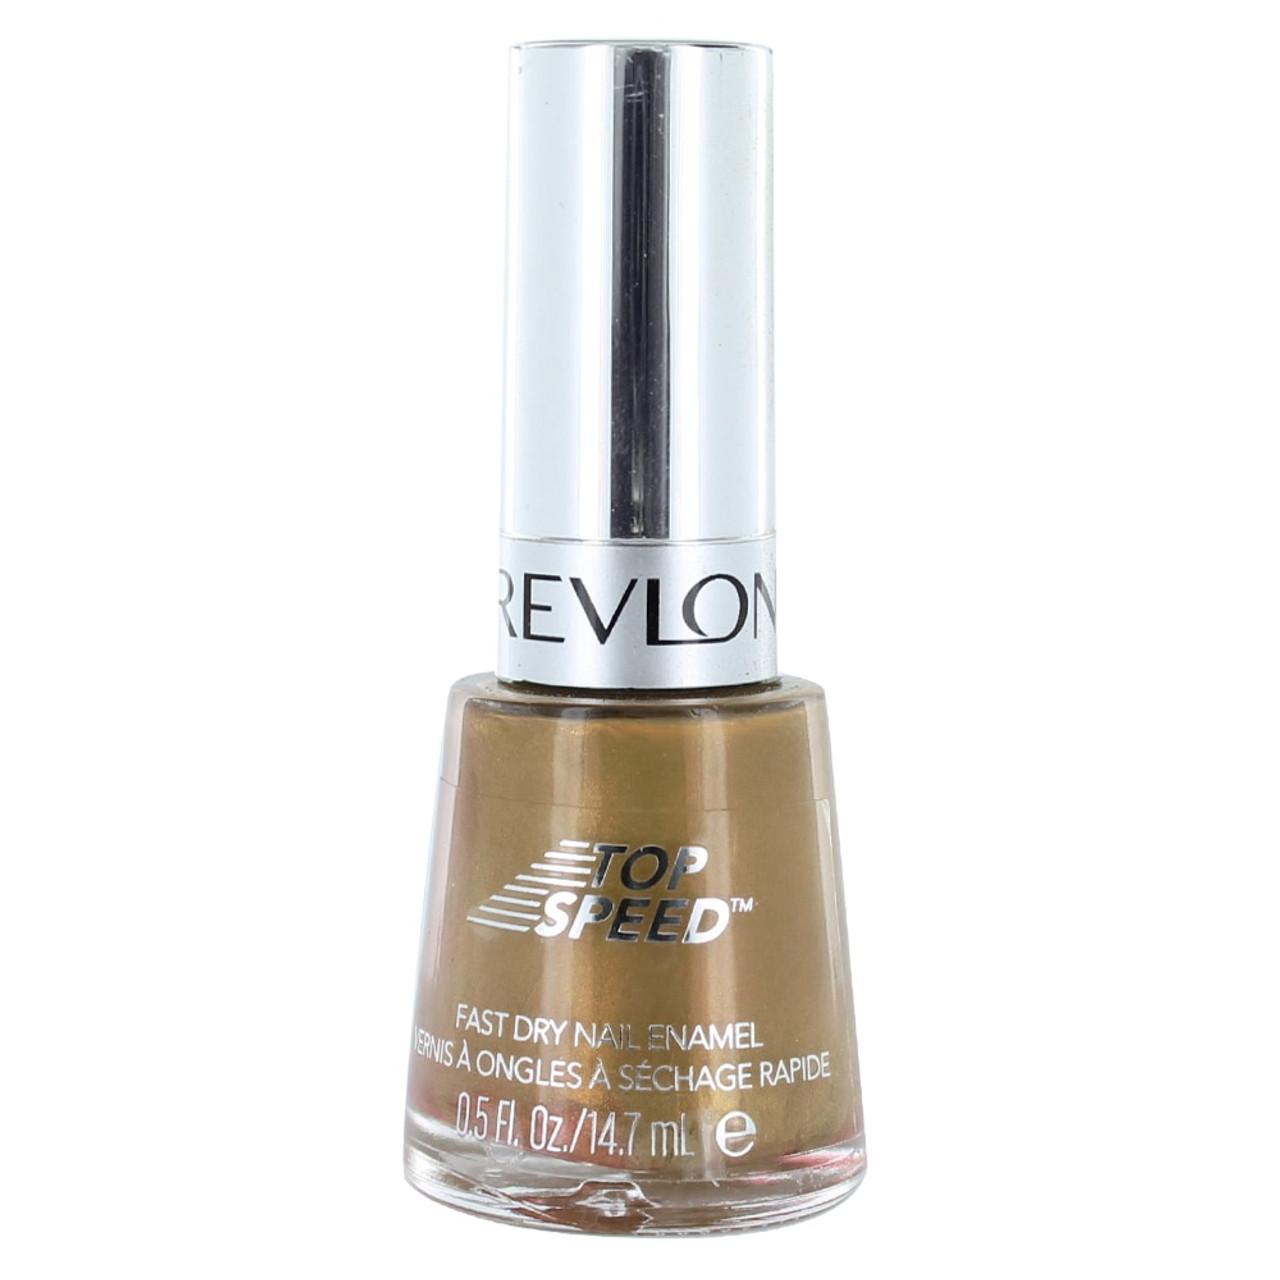 Revlon Top Speed Fast Dry Nail Enamel, .5oz - BuyMeBeauty.com